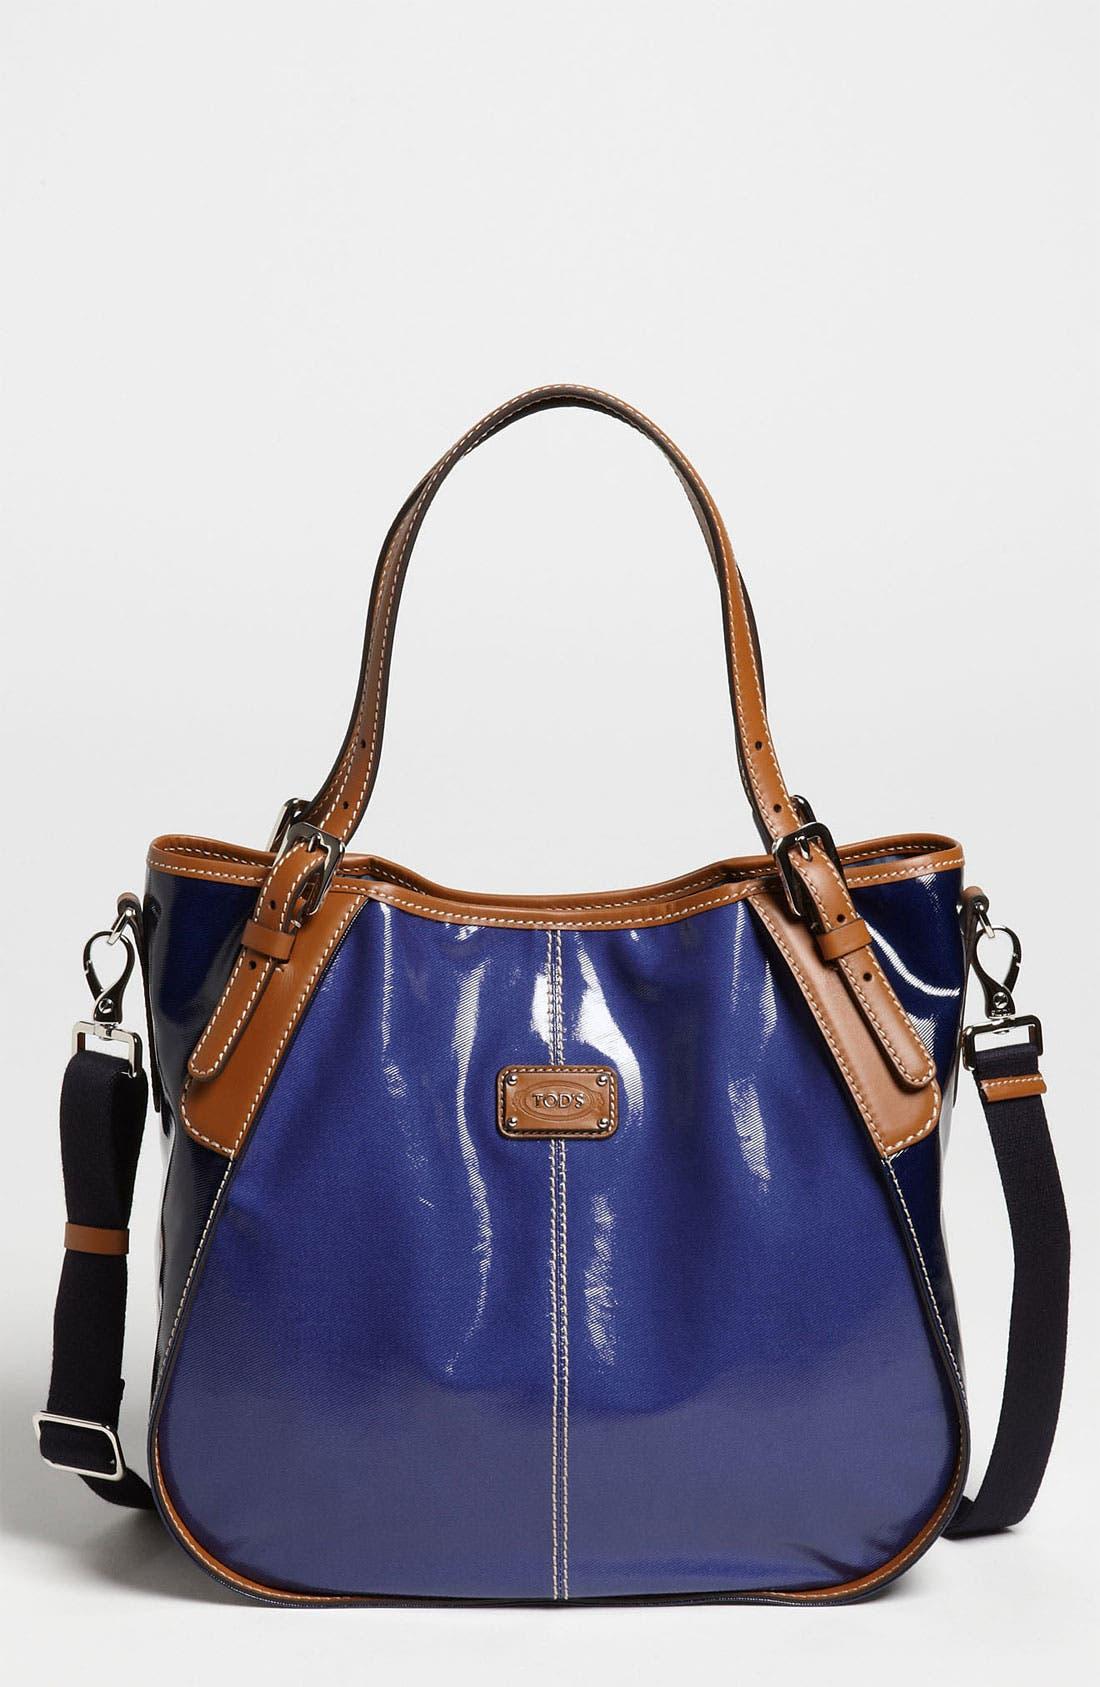 Alternate Image 1 Selected - Tod's 'New G - Small' Shoulder Bag